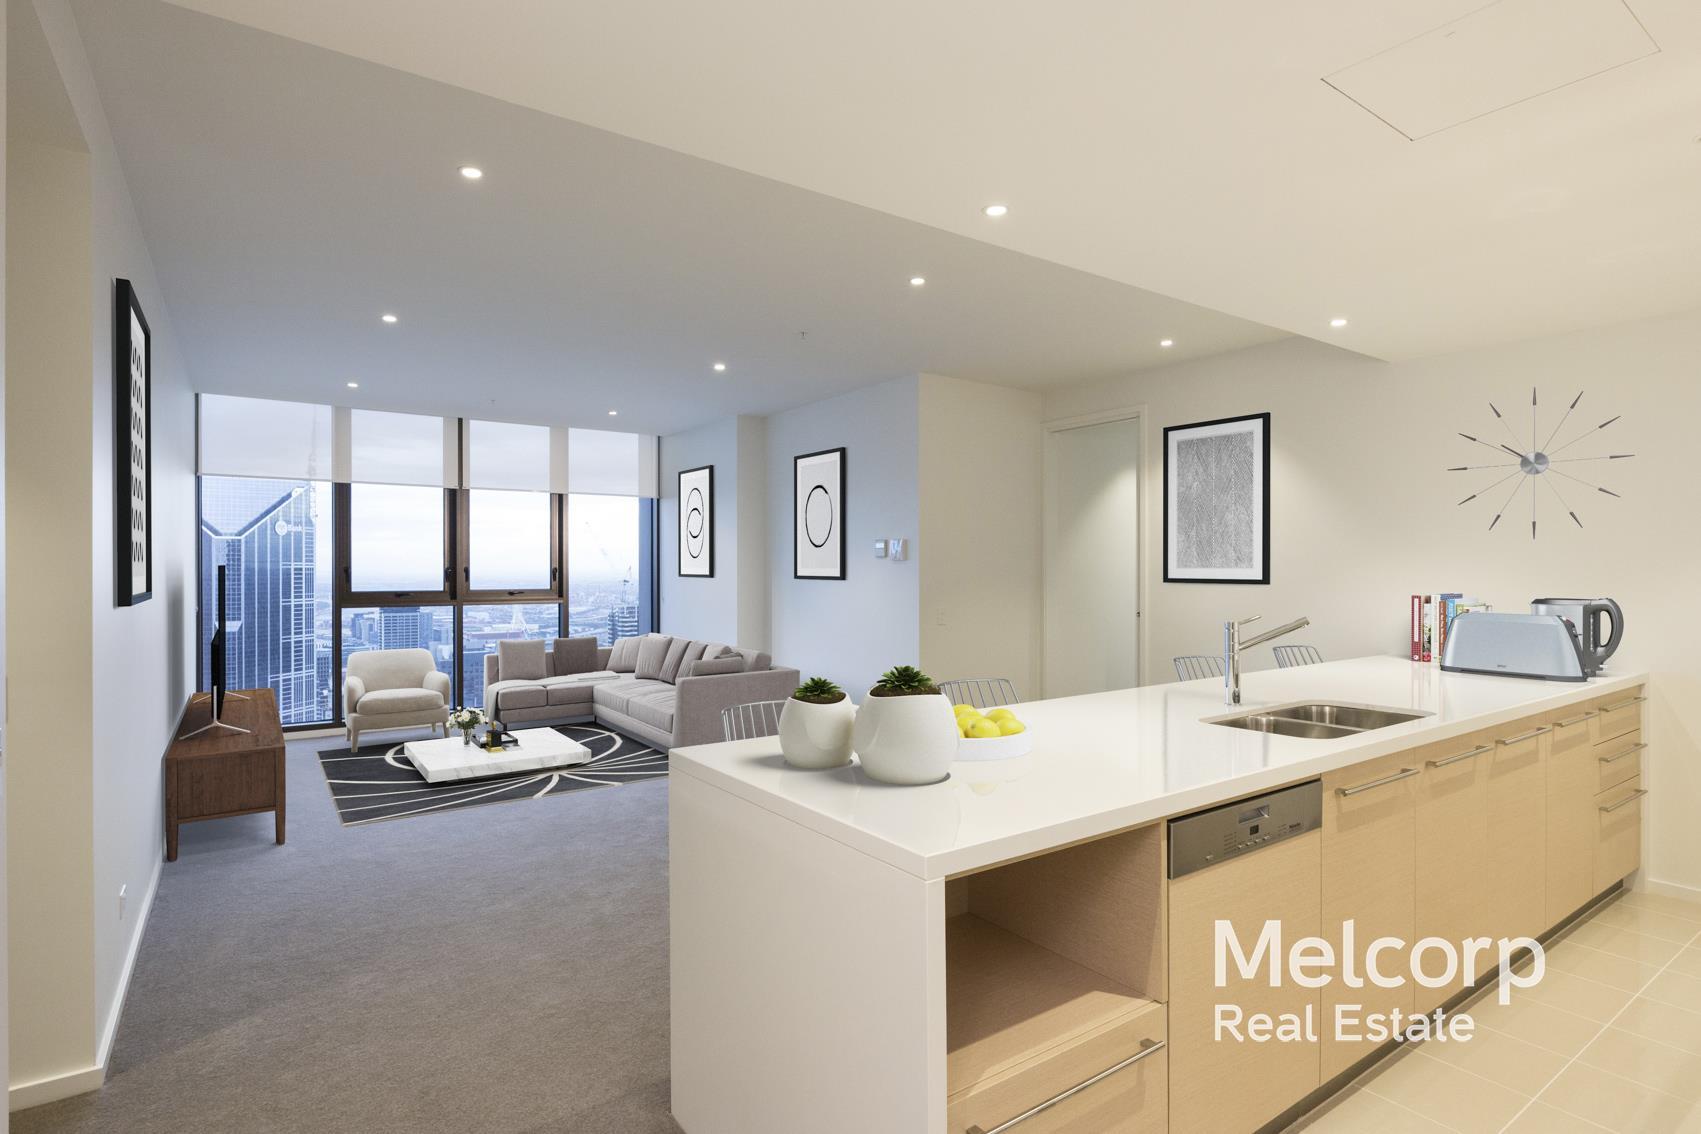 Home Design Level 50 Part - 47: LEVEL 50, 5008/318 Russell Street, Melbourne, VIC 3000 Sale U0026 Rental  History - Property 360